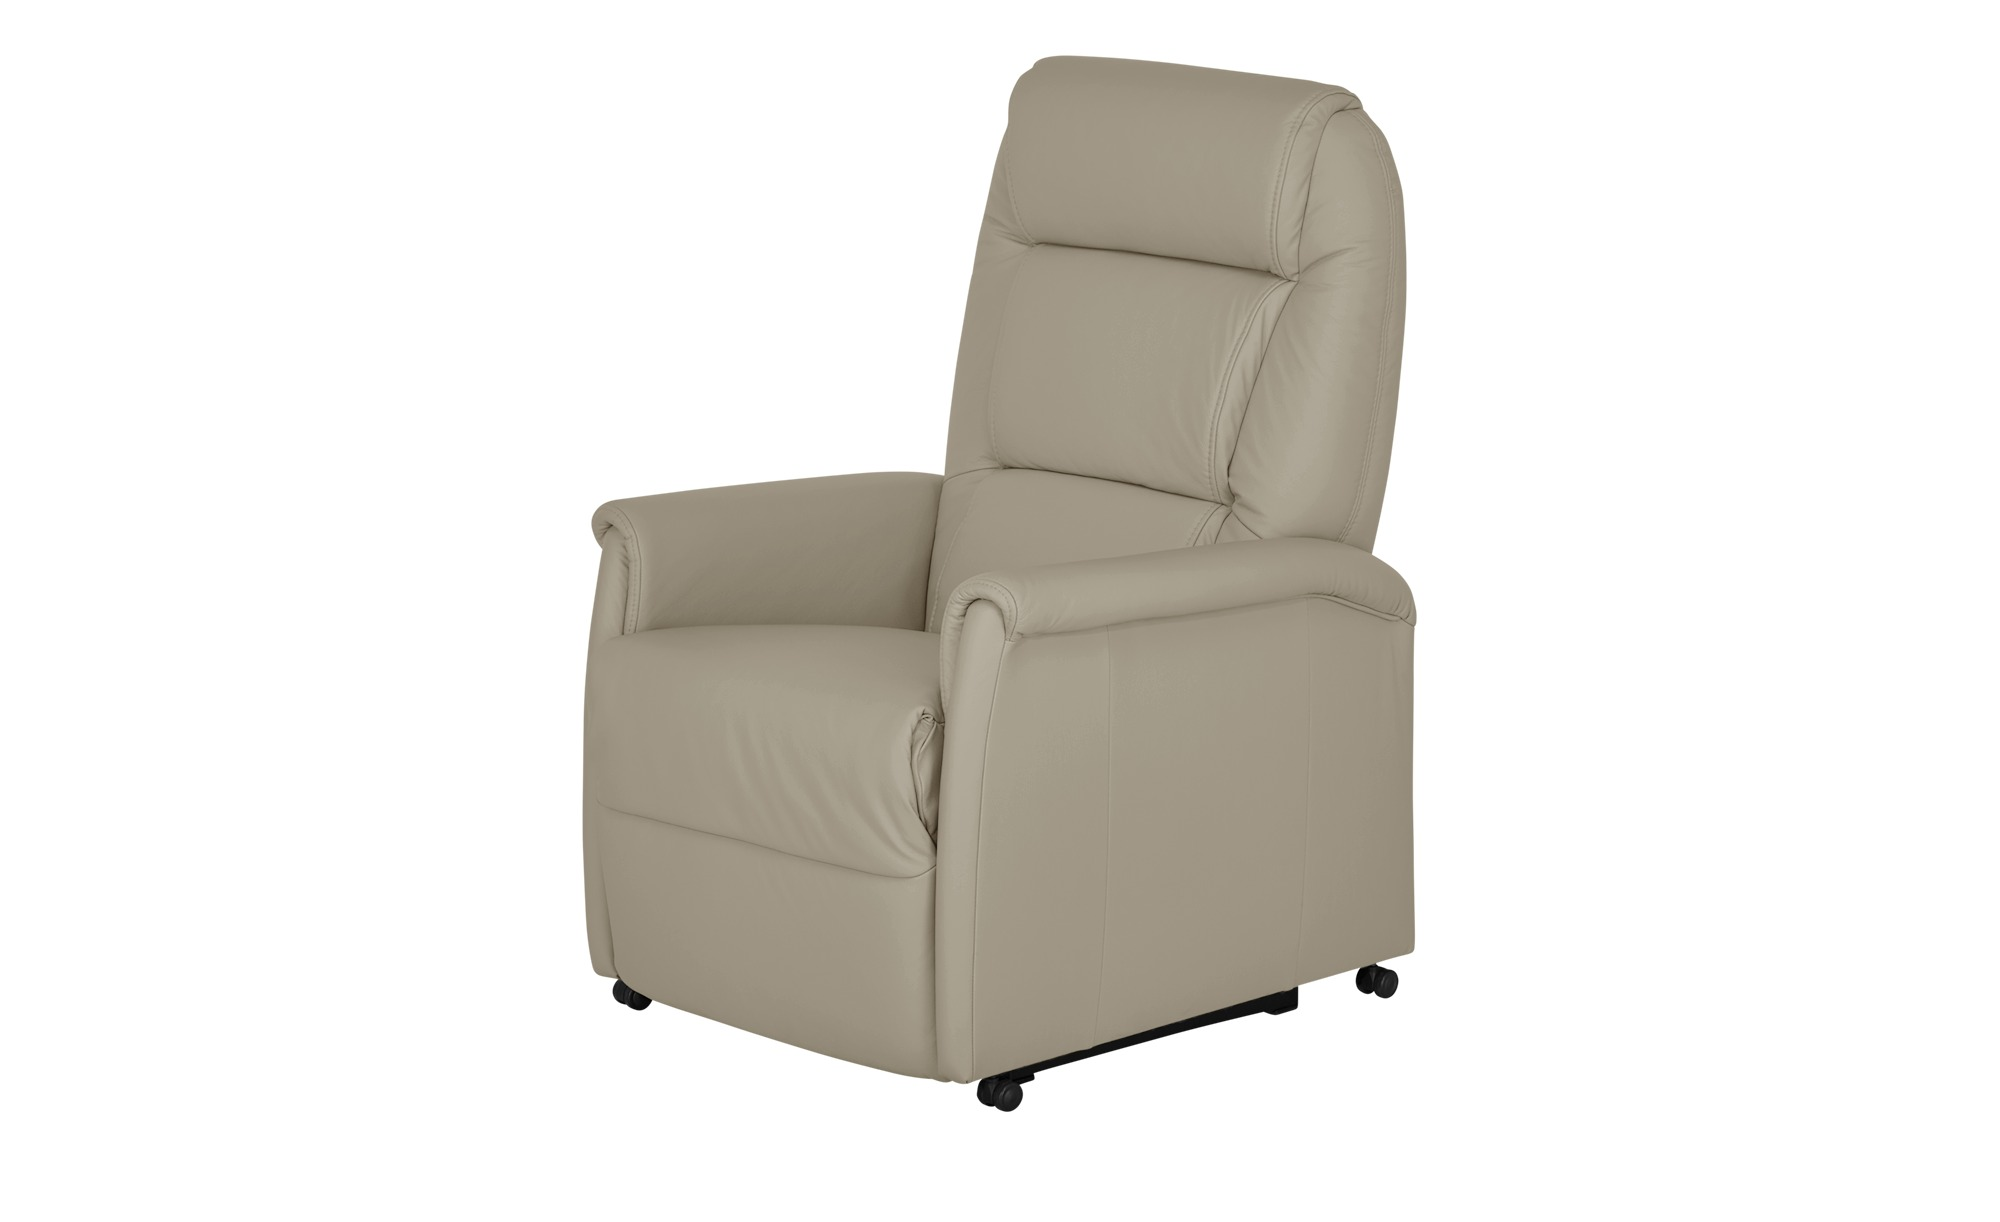 Fernsehsessel grau - Leder Femke ¦ grau ¦ Maße (cm): B: 74 H: 110 T: 85 Polstermöbel > Sessel > Fernsehsessel - Höffner